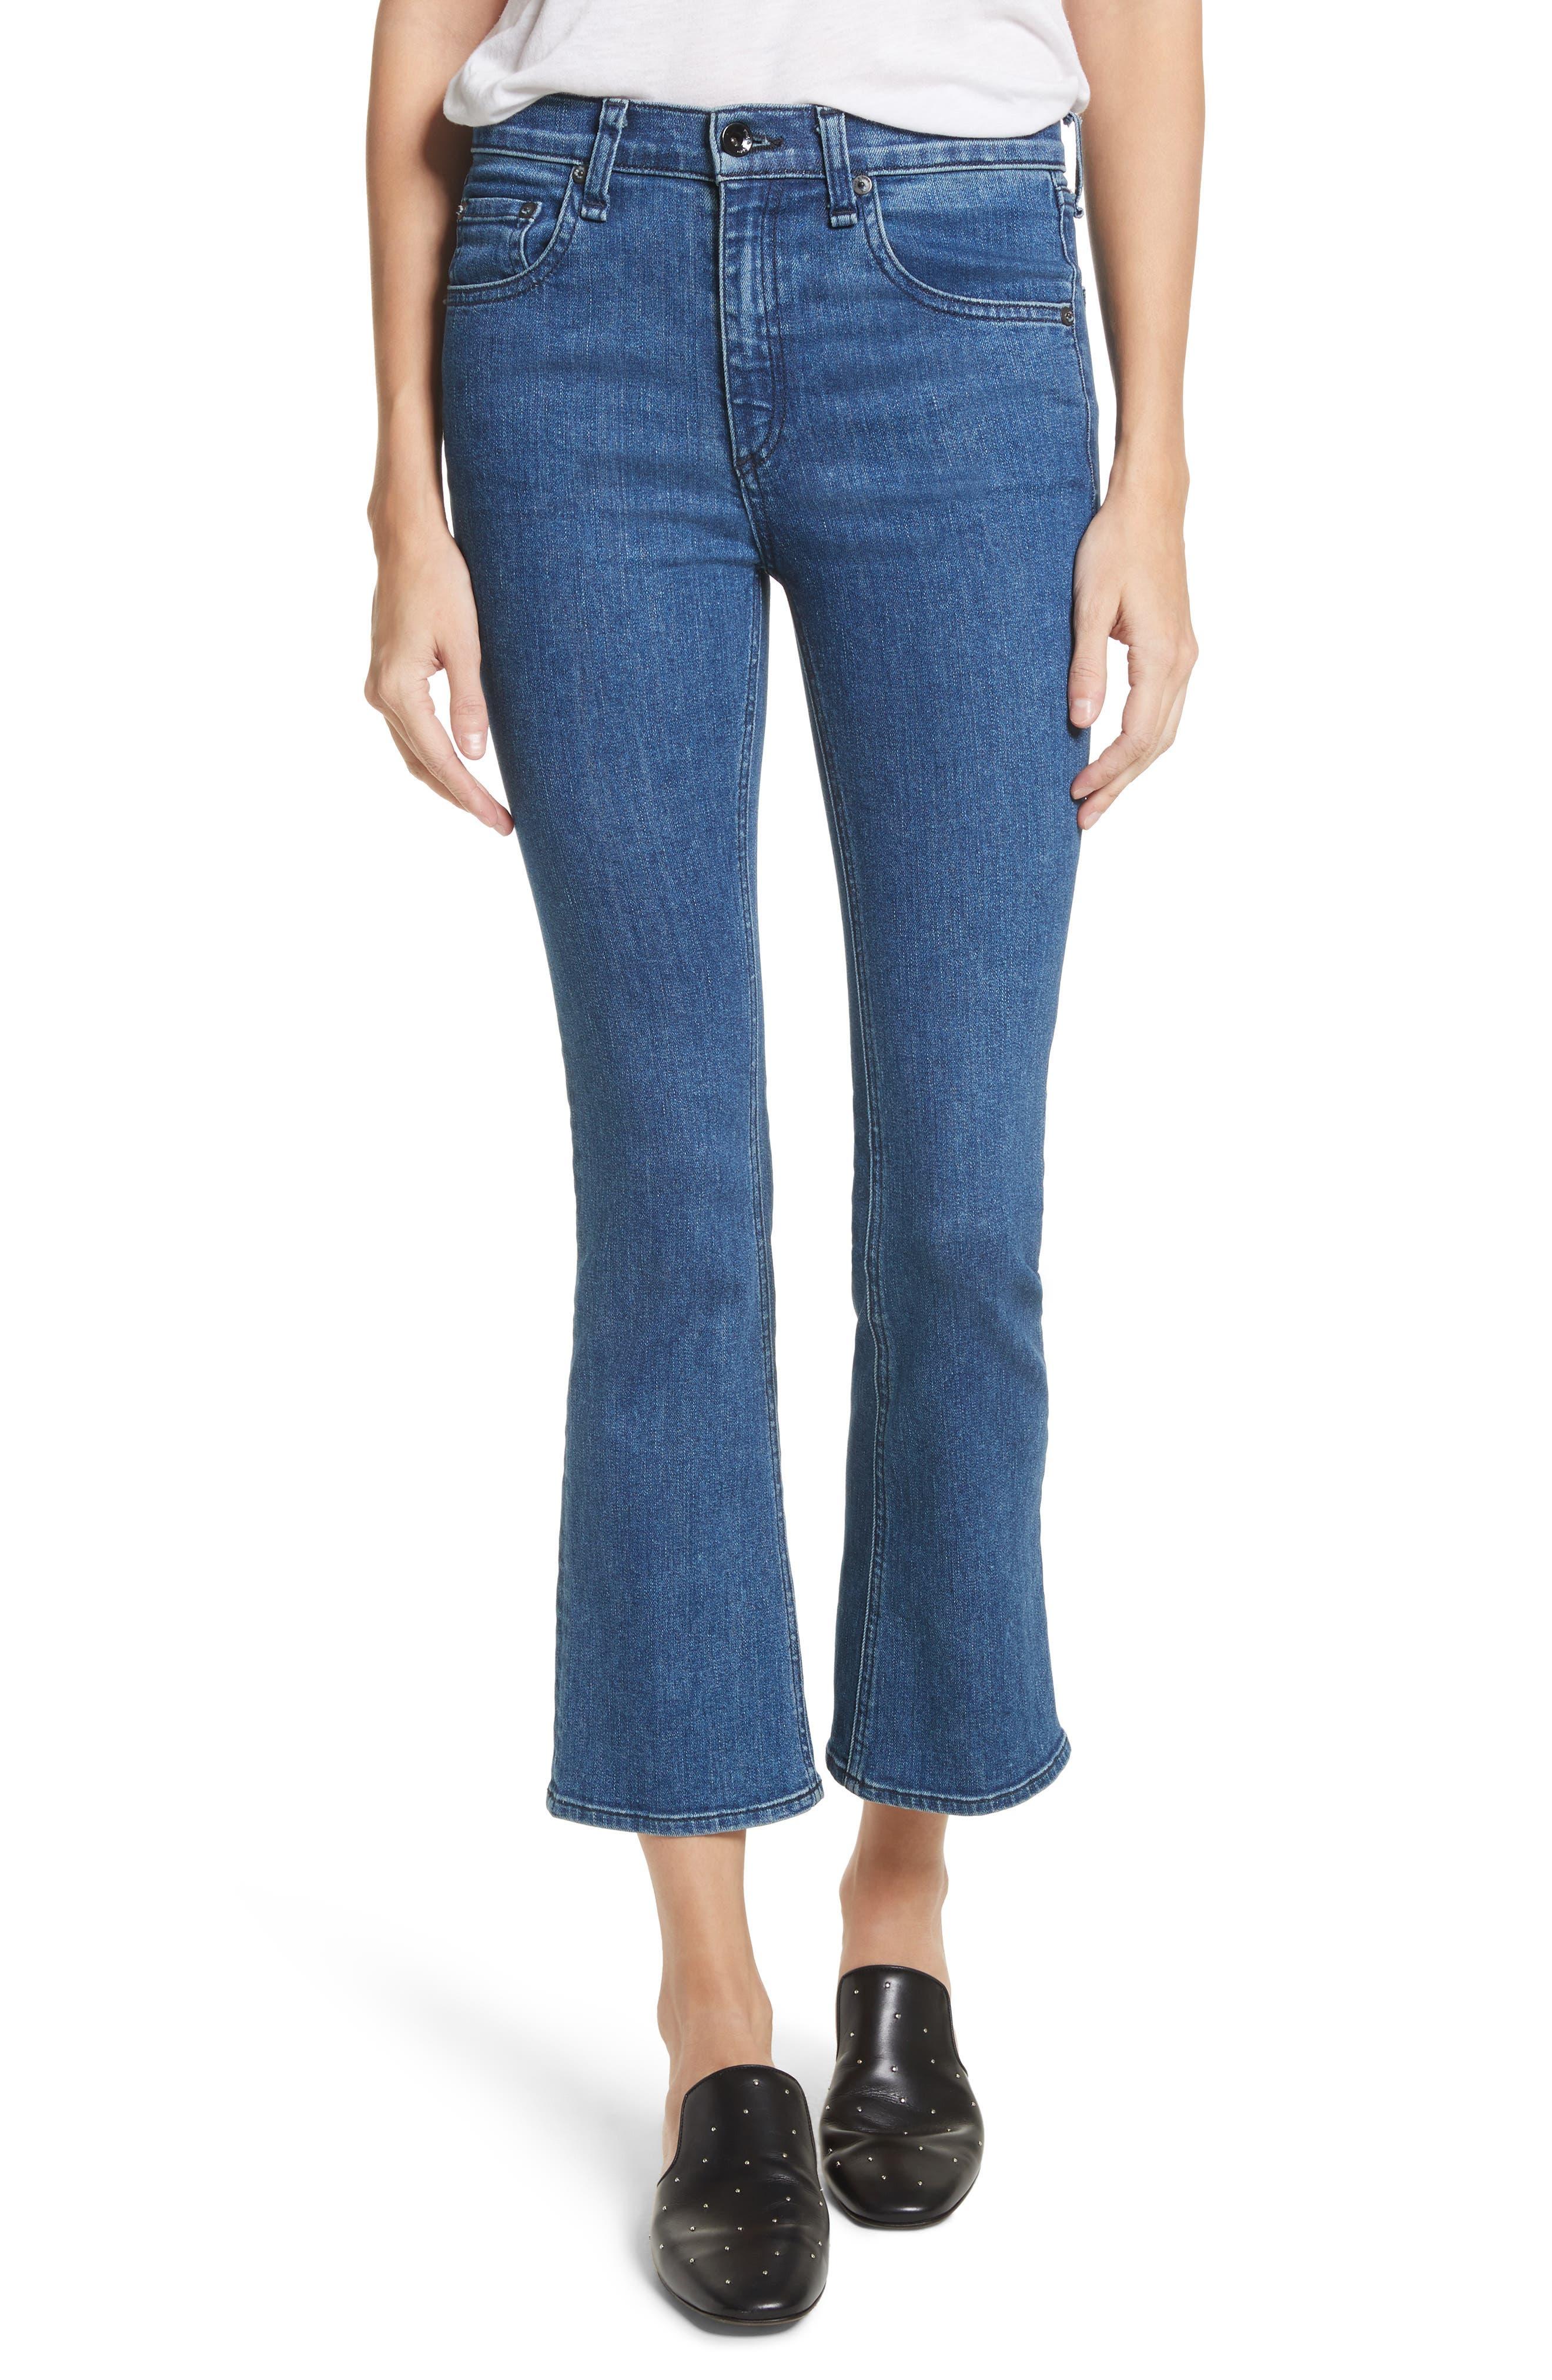 Hana High Waist Crop Bootcut Jeans,                         Main,                         color, 420